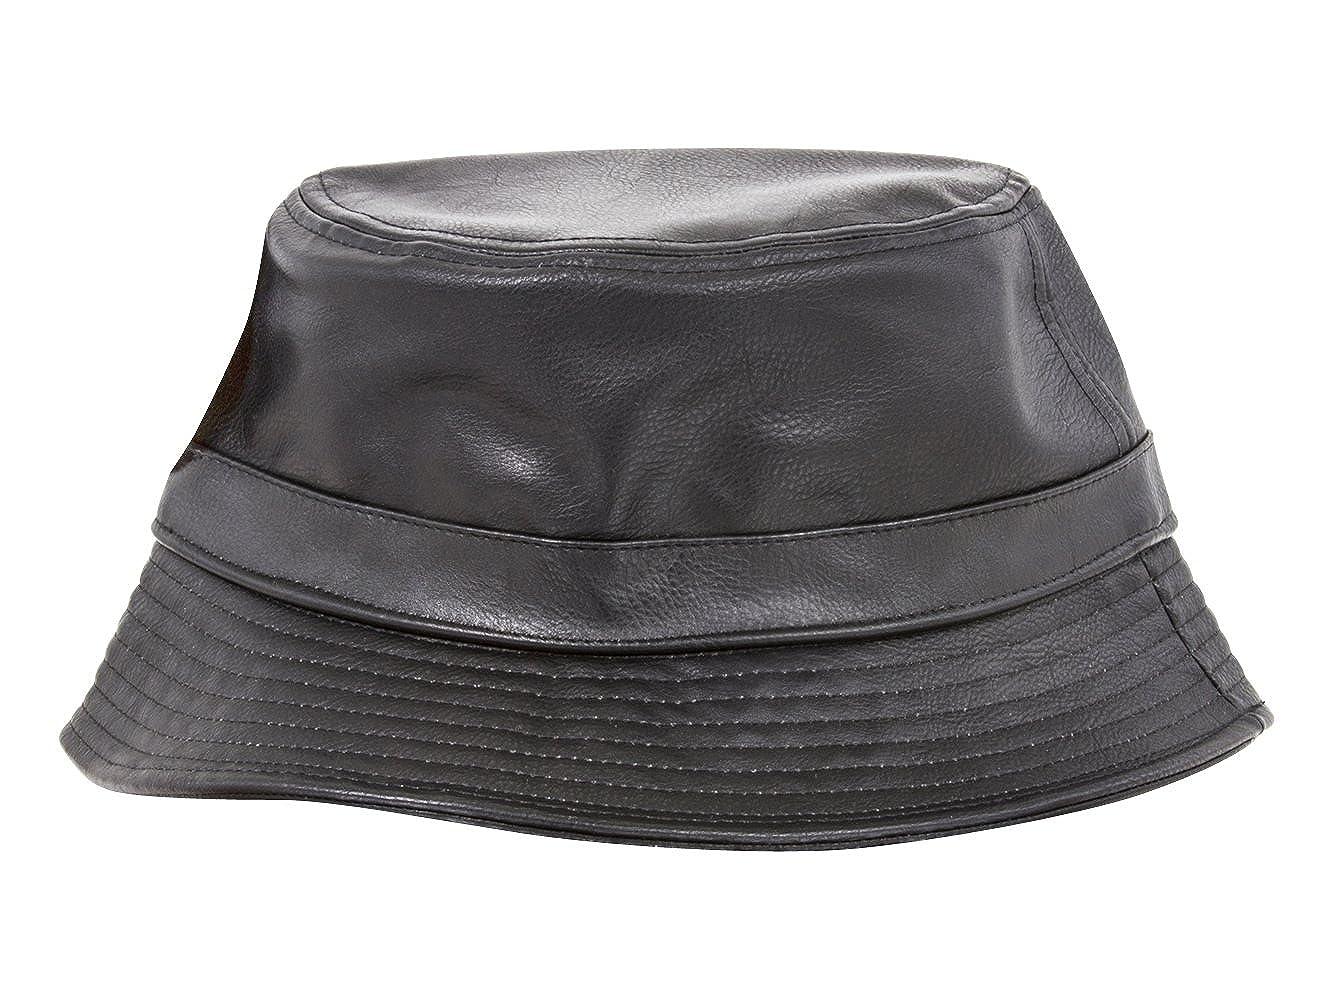 e2b018216ea TOP HEADWEAR PU Leather Bucket Hat - Black at Amazon Men s Clothing store